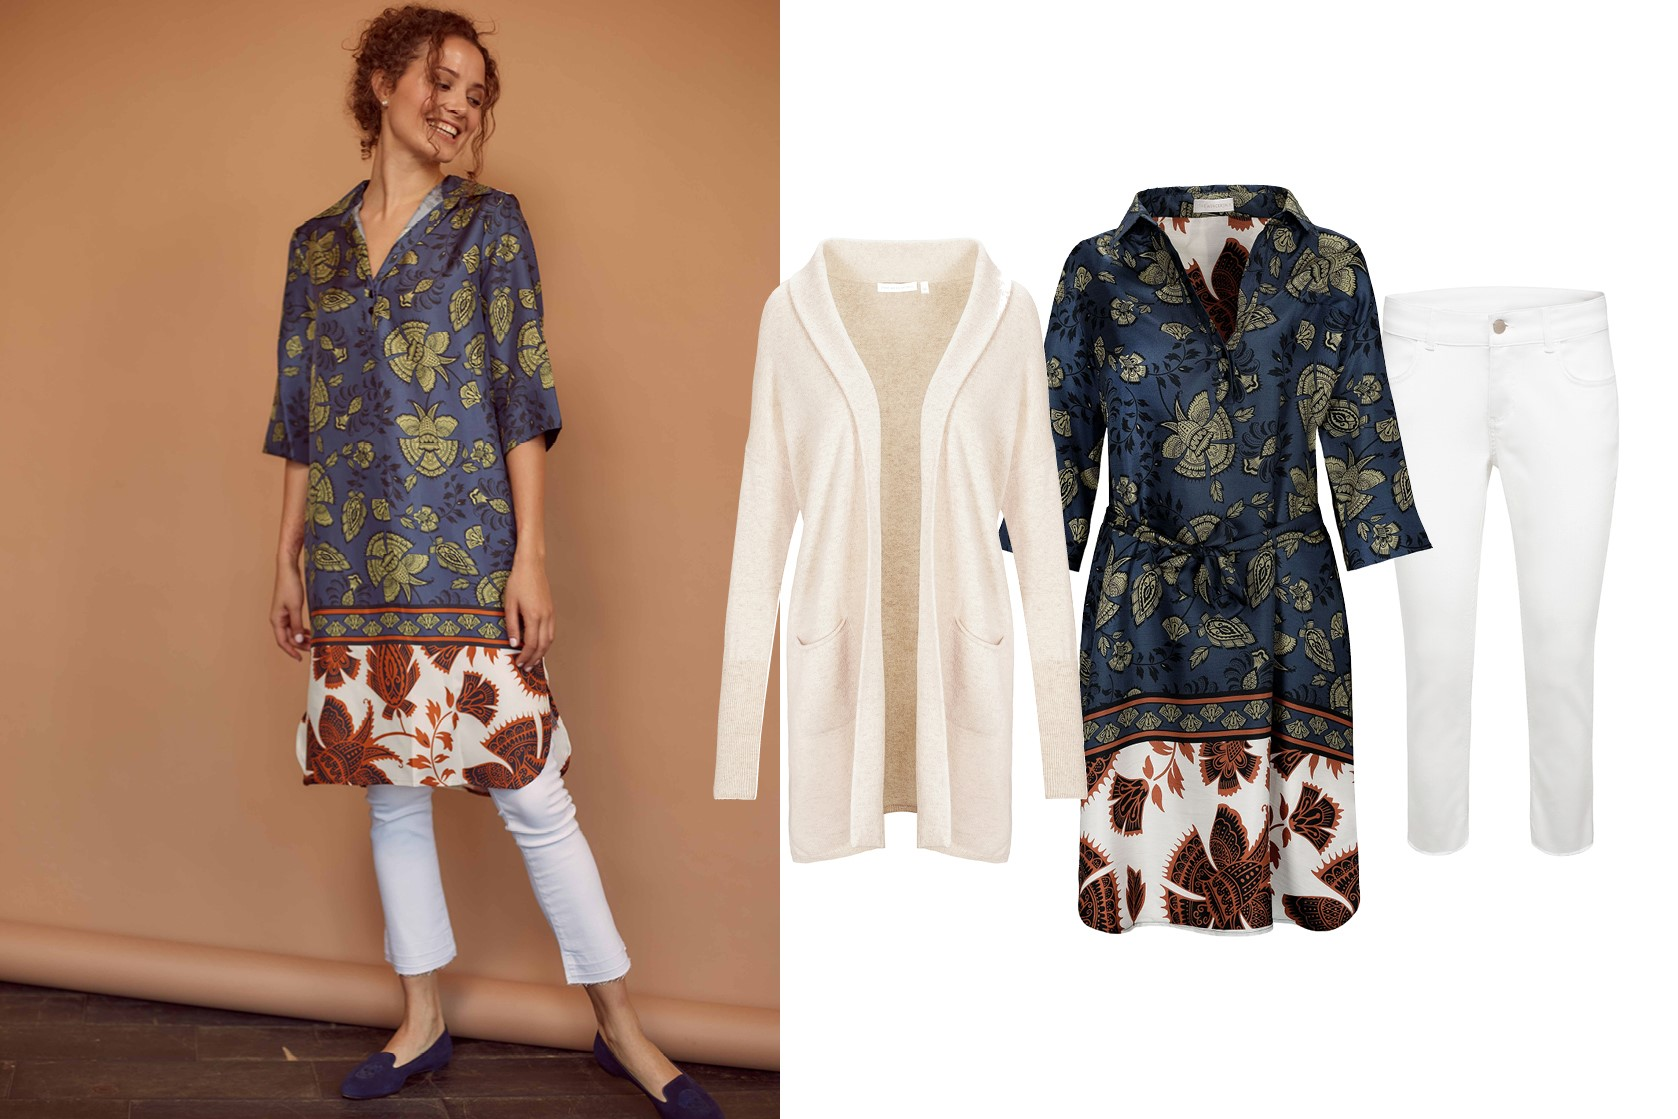 Easy Fashion - Lagen-Look Styling Tipp